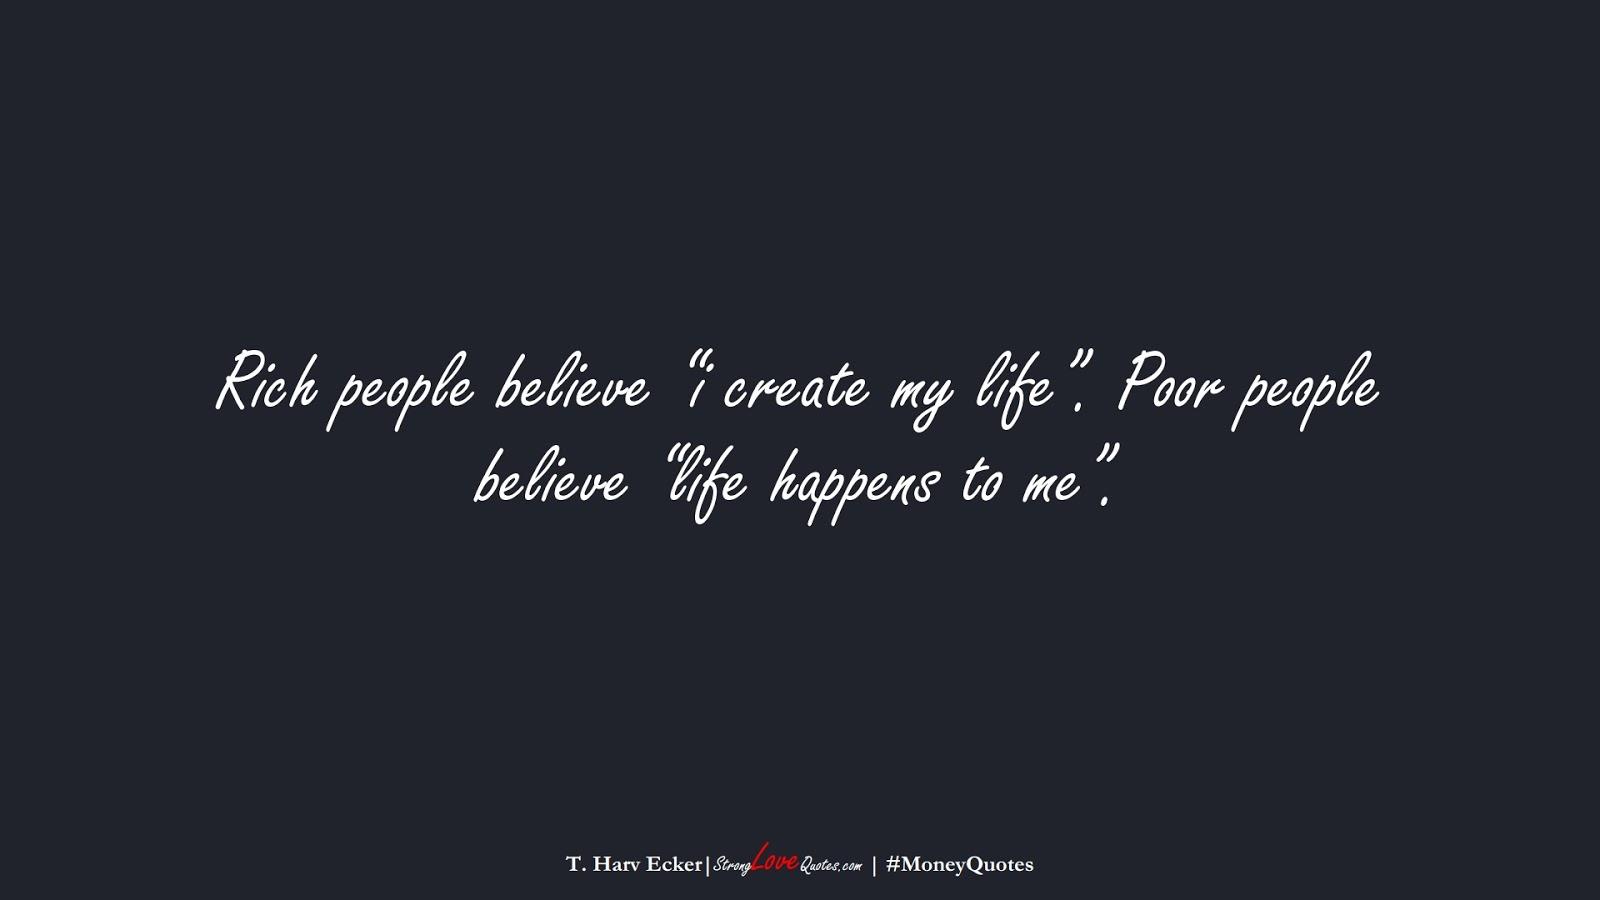 "Rich people believe ""i create my life"". Poor people believe ""life happens to me"". (T. Harv Ecker);  #MoneyQuotes"